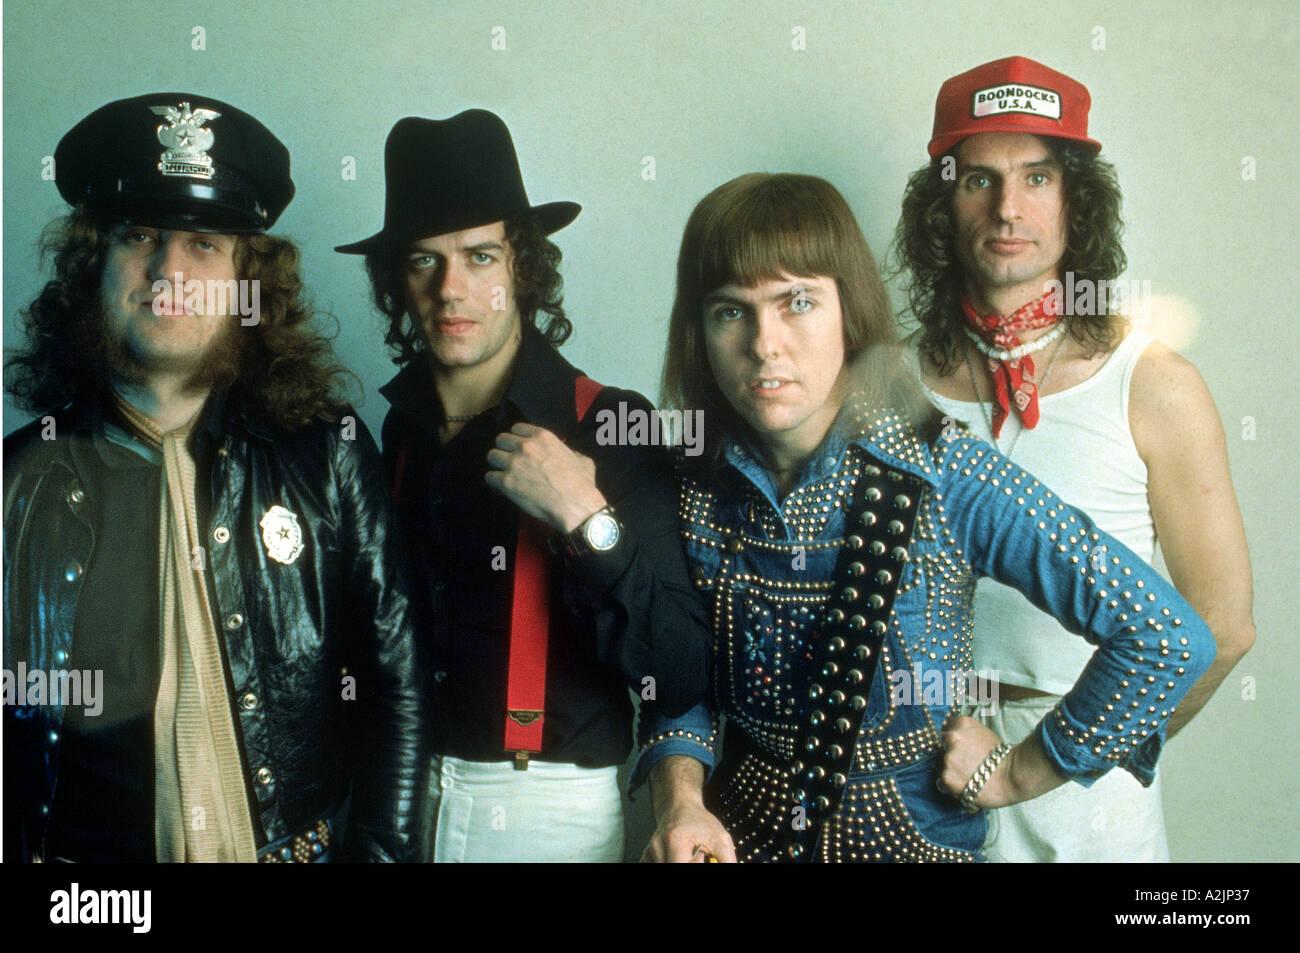 SLADE UK Glam Rock band of the 70swith Noddy Holder at left - Stock Image